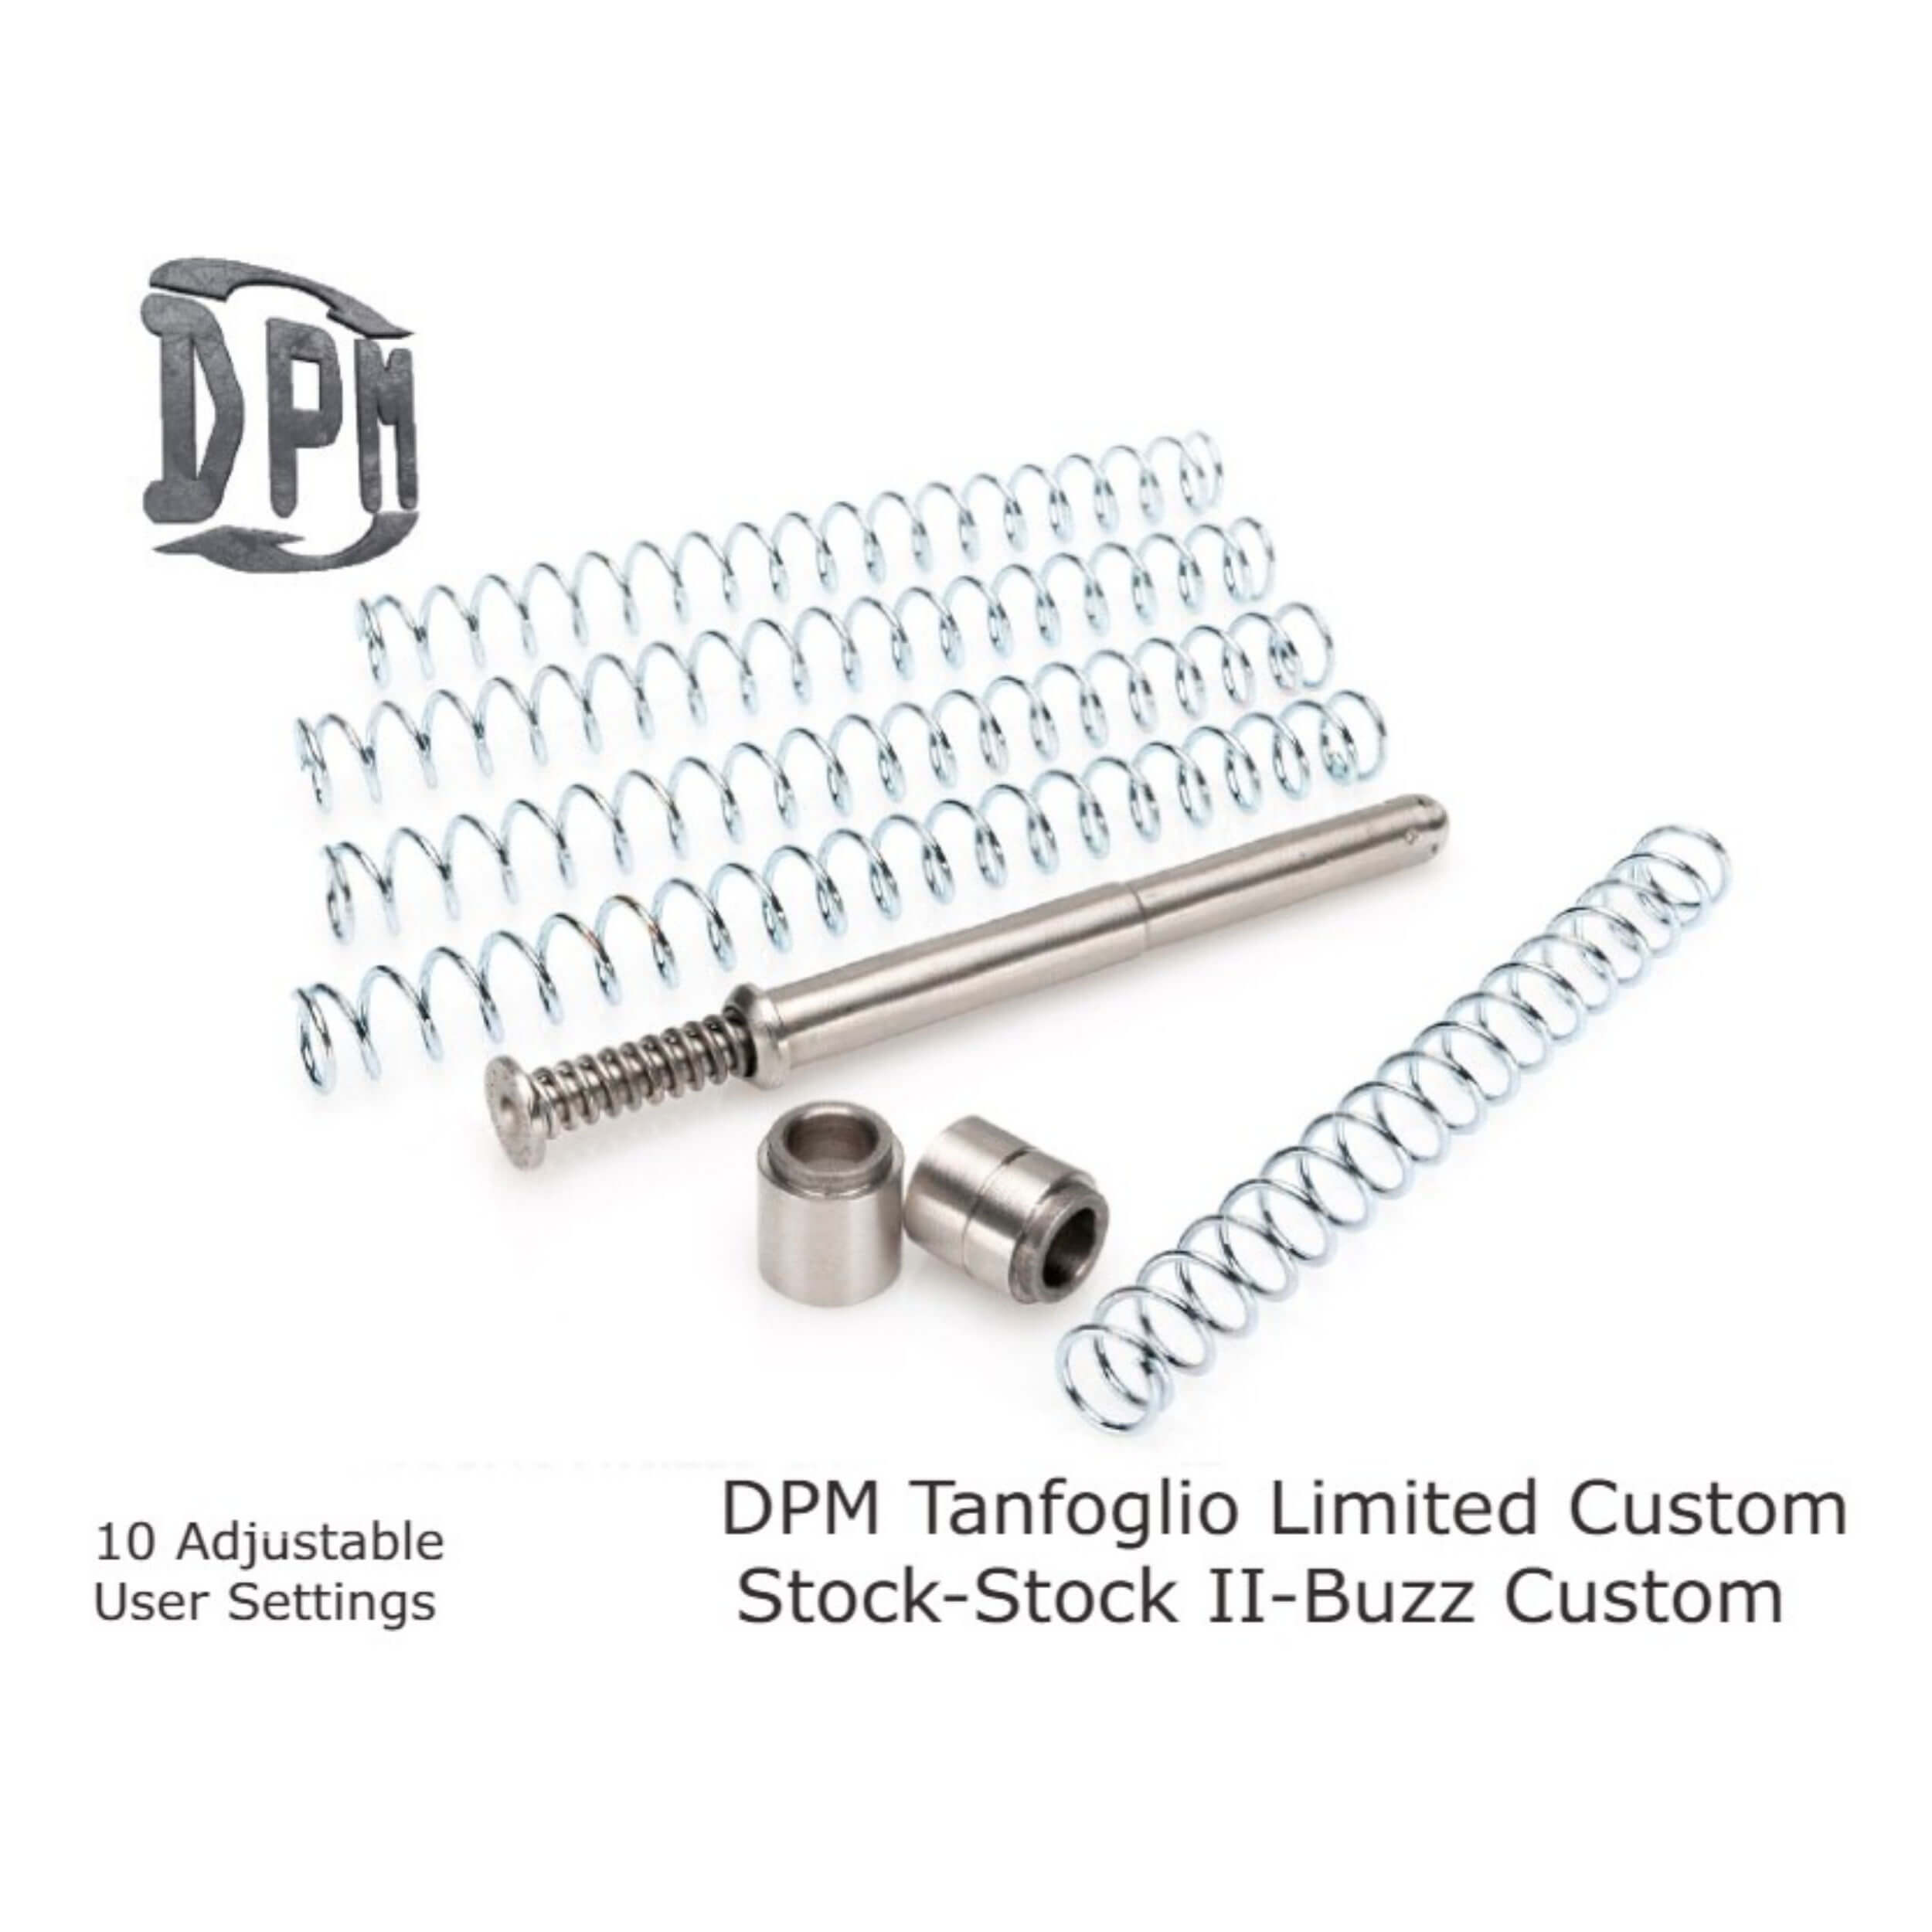 Tanfoglio Limited Custom - Stock - Stock II - Buzz Custom - 10 Settings All Calibers